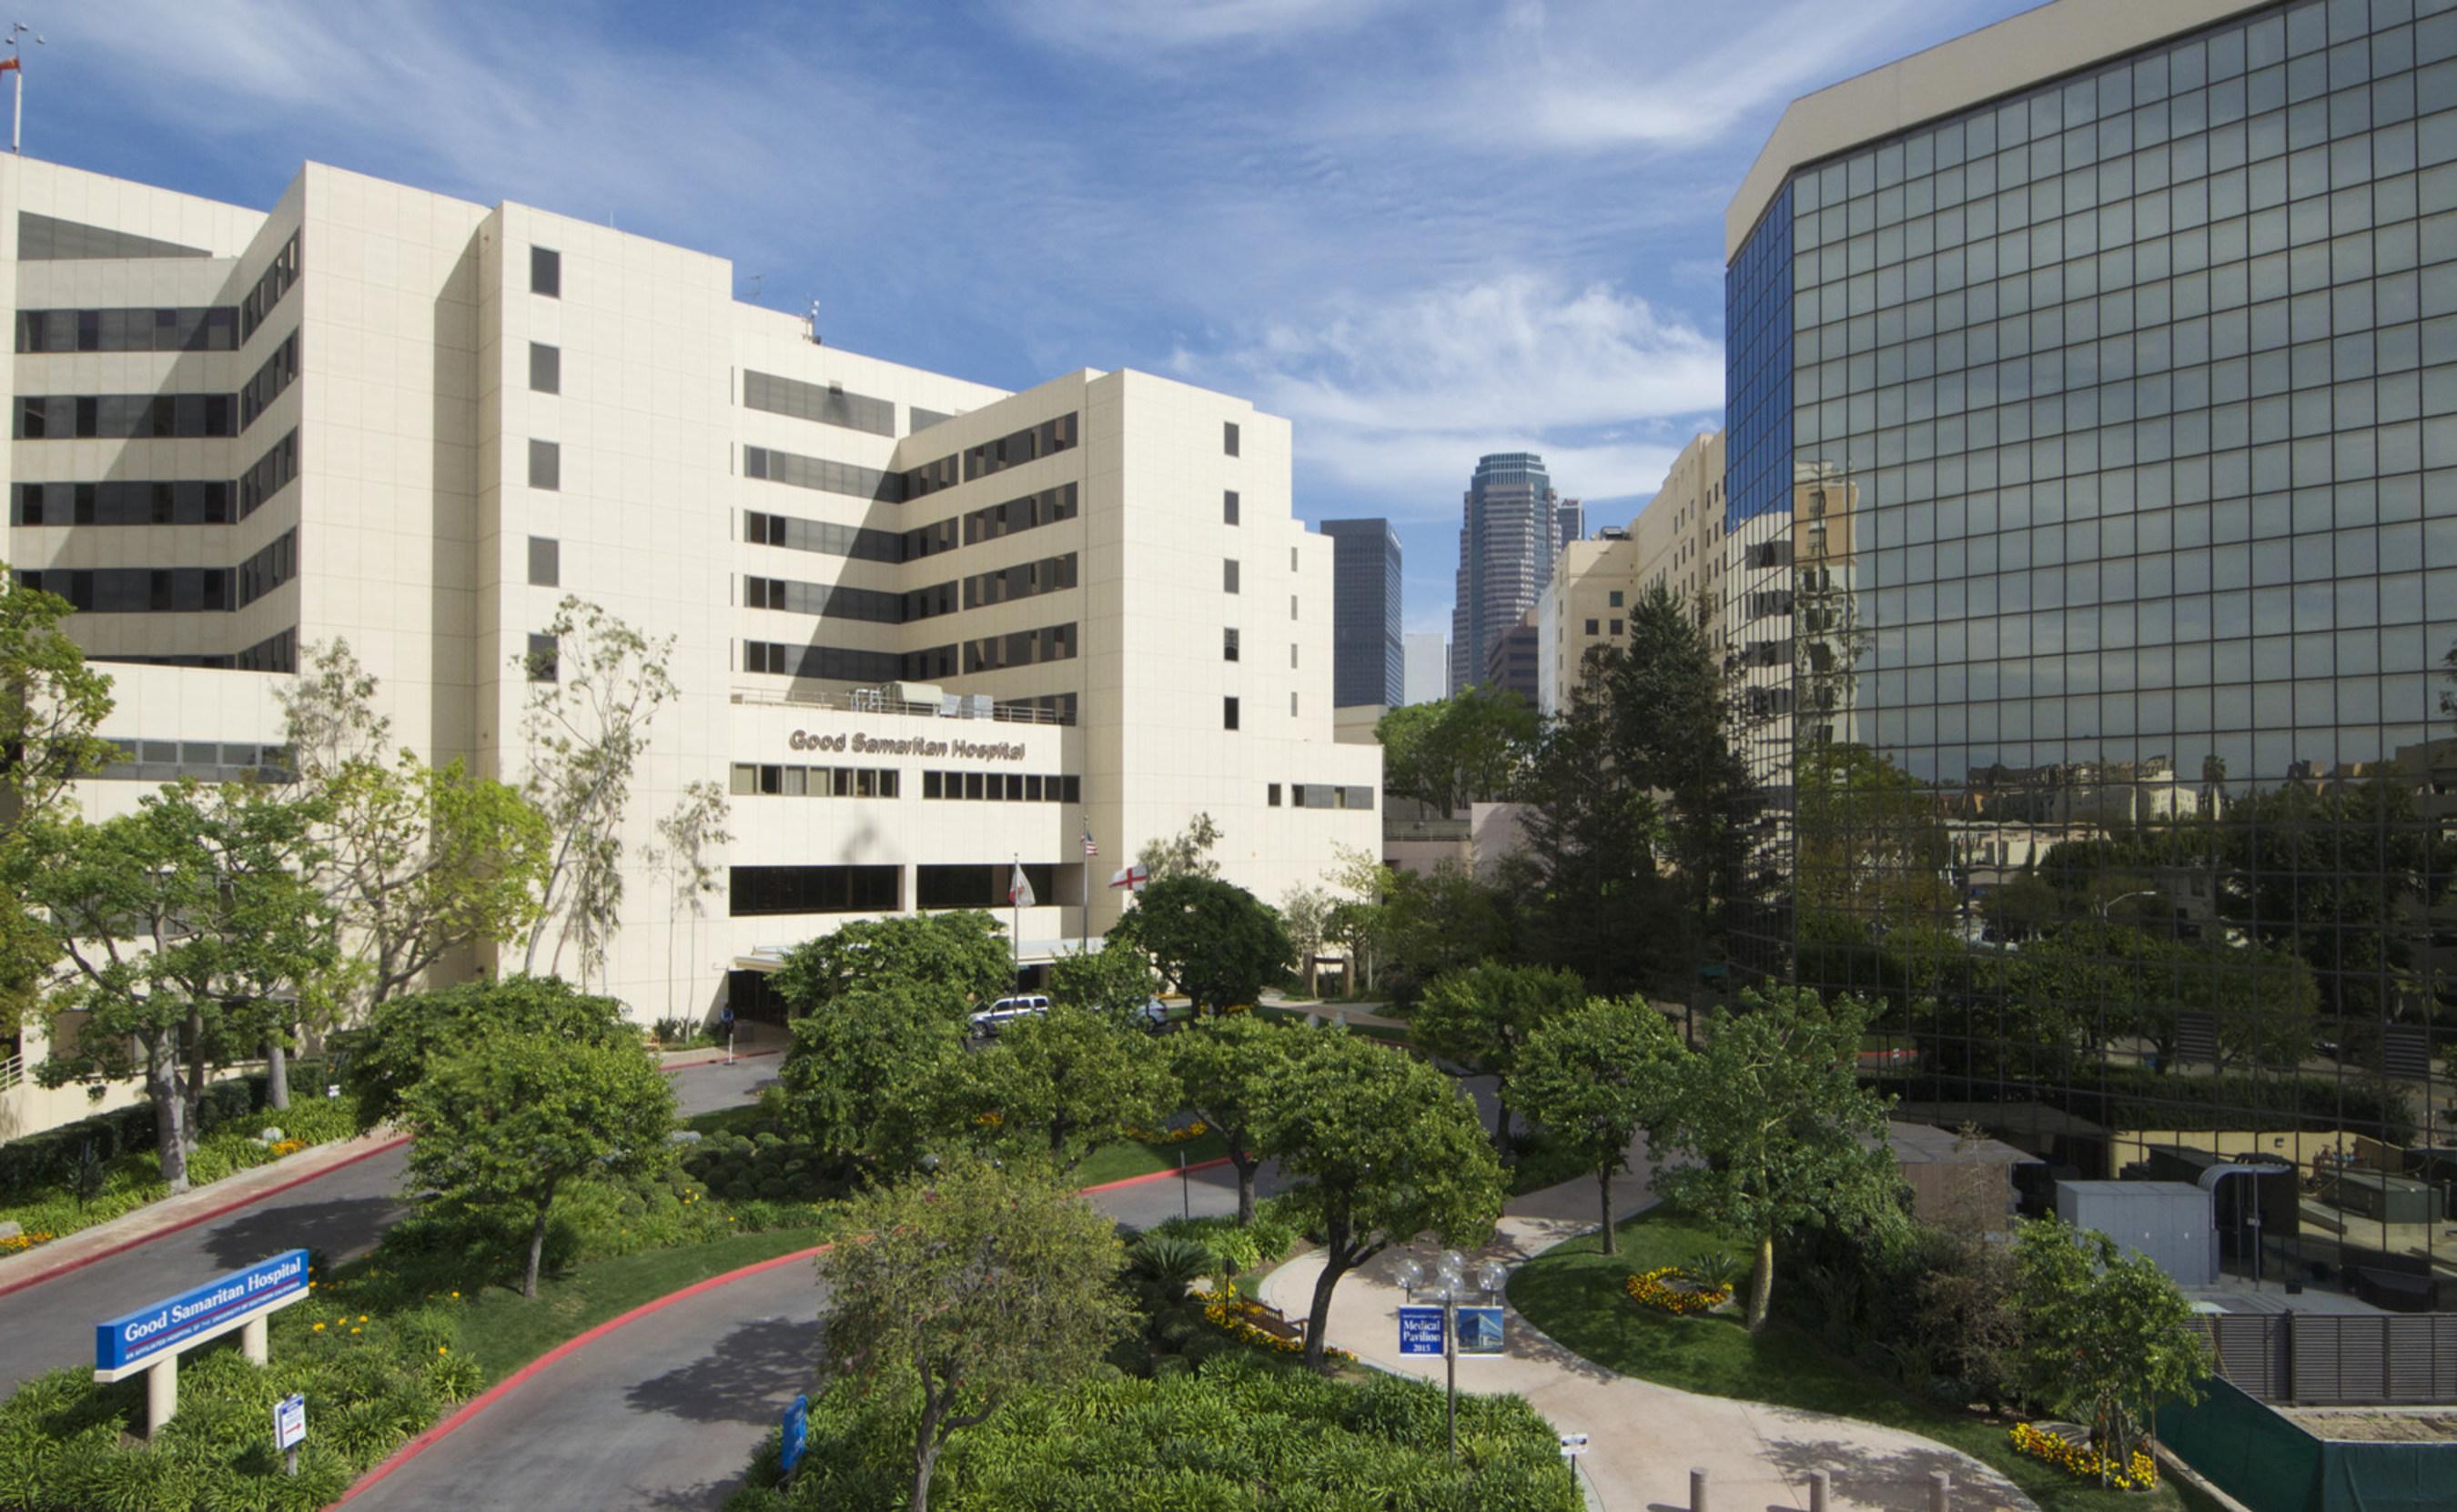 Good Samaritan Hospital Receives Baby-Friendly® Designation